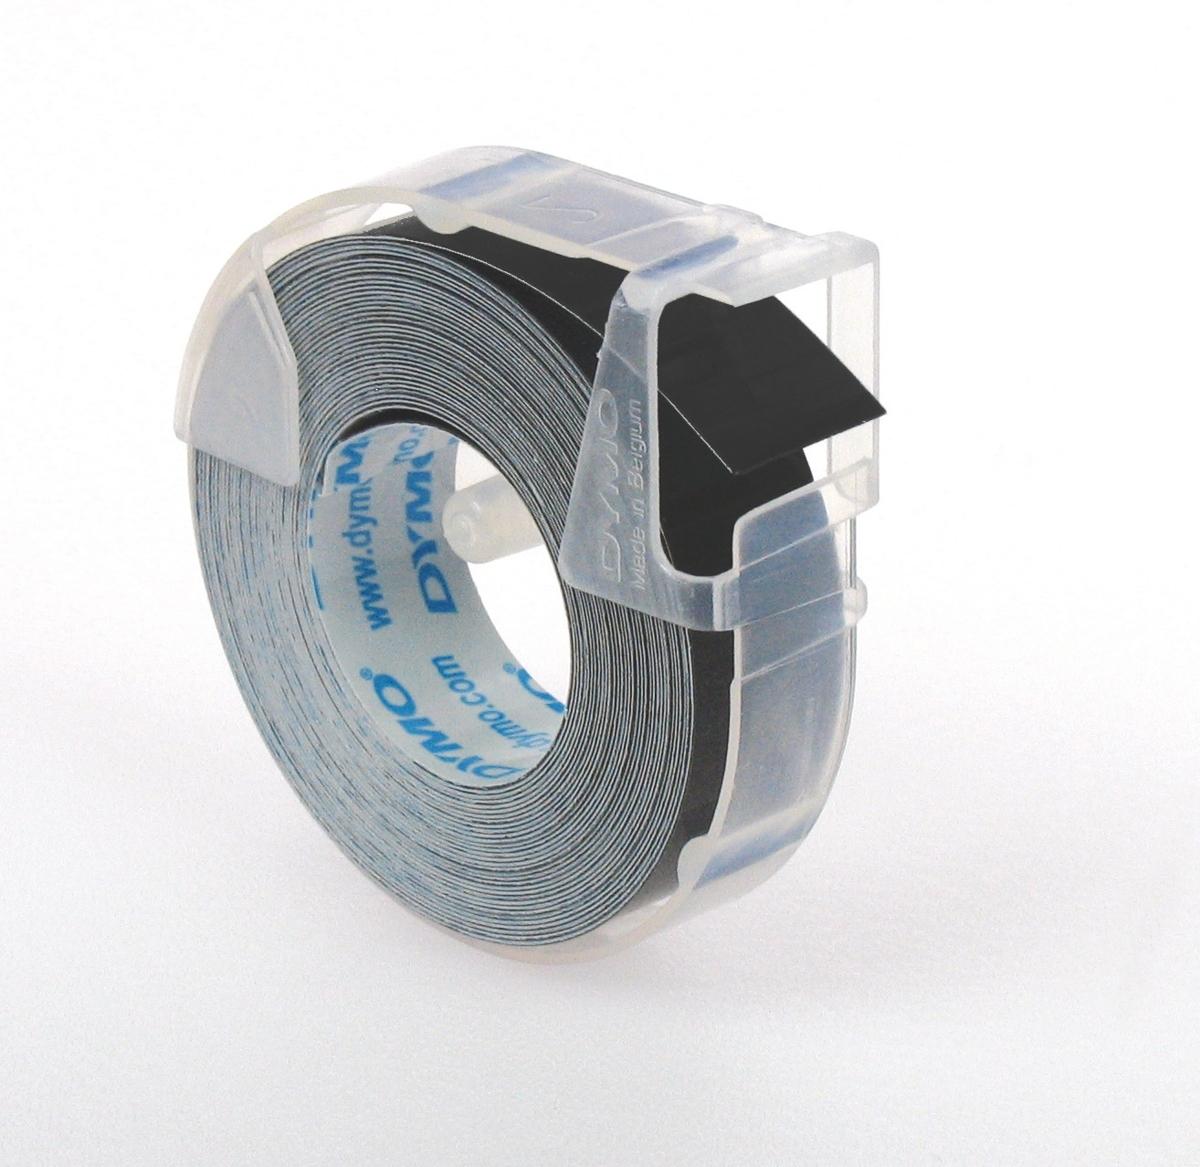 Páska DYMO 3D 9 mm 3 m blistr černá 3 kusy